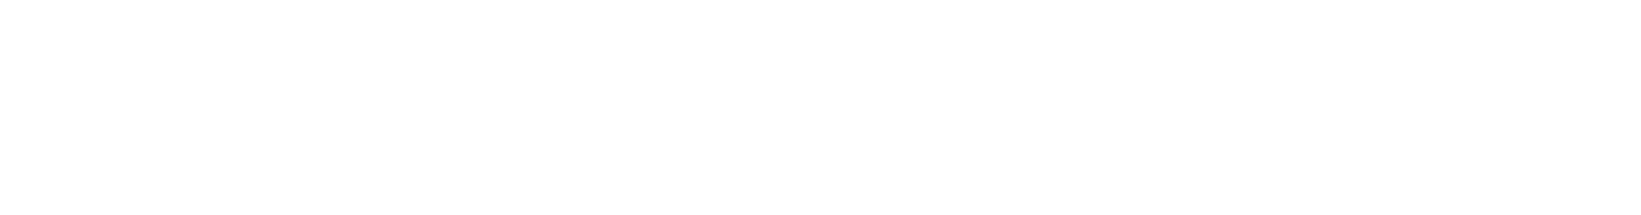 Sauna casinot logo